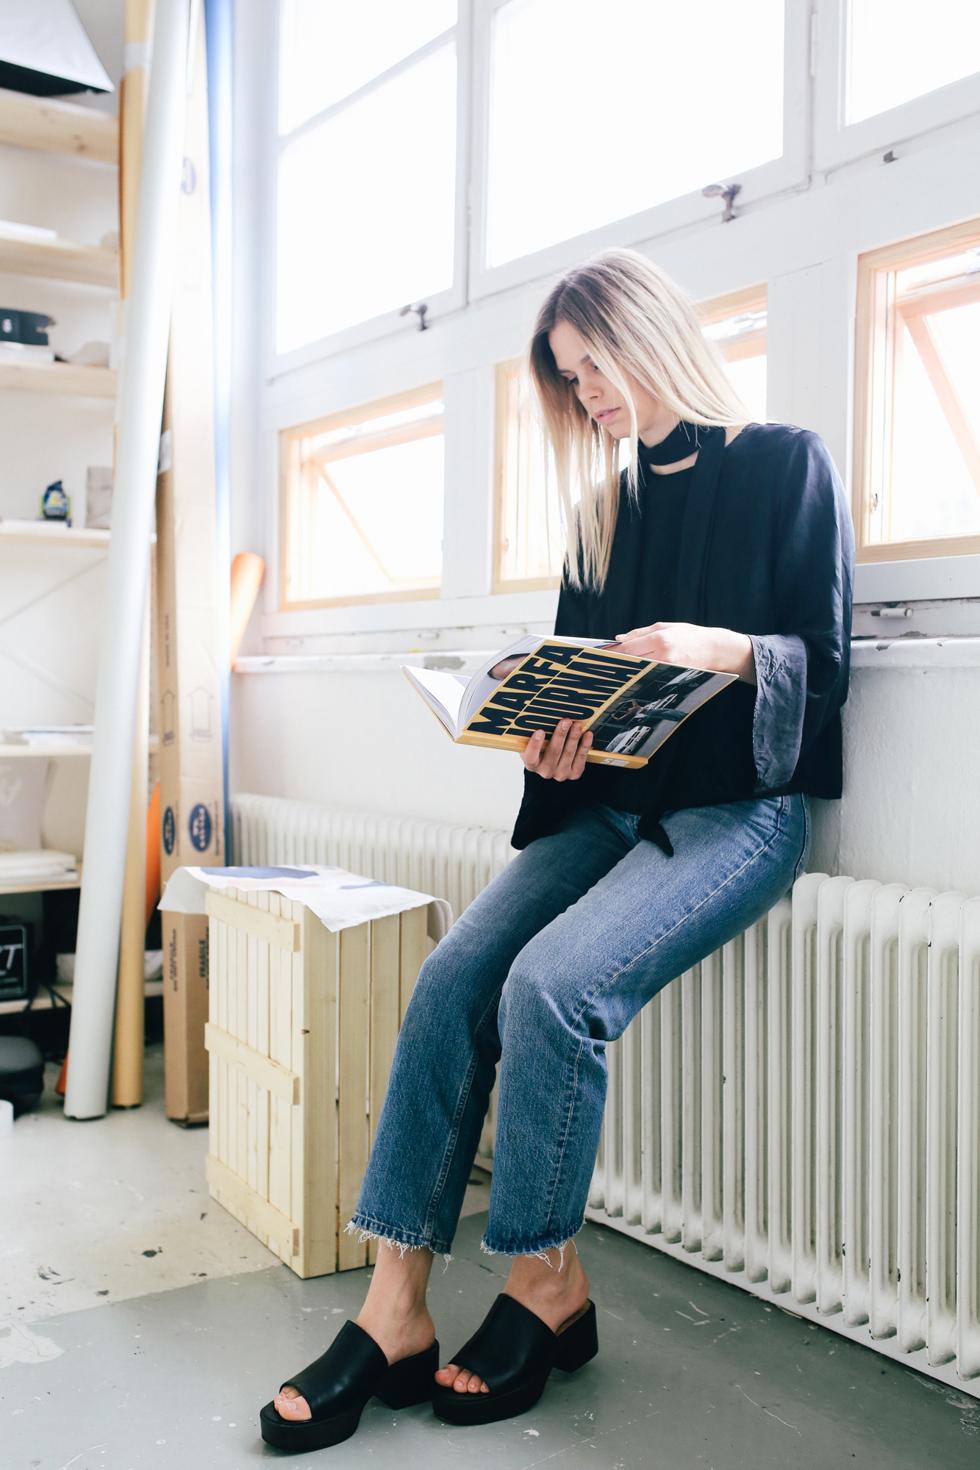 Flora Wiström, florasblogg.se, @florawis - scarf, silke blouse, bell sleeve, frayed jeans, slip ins